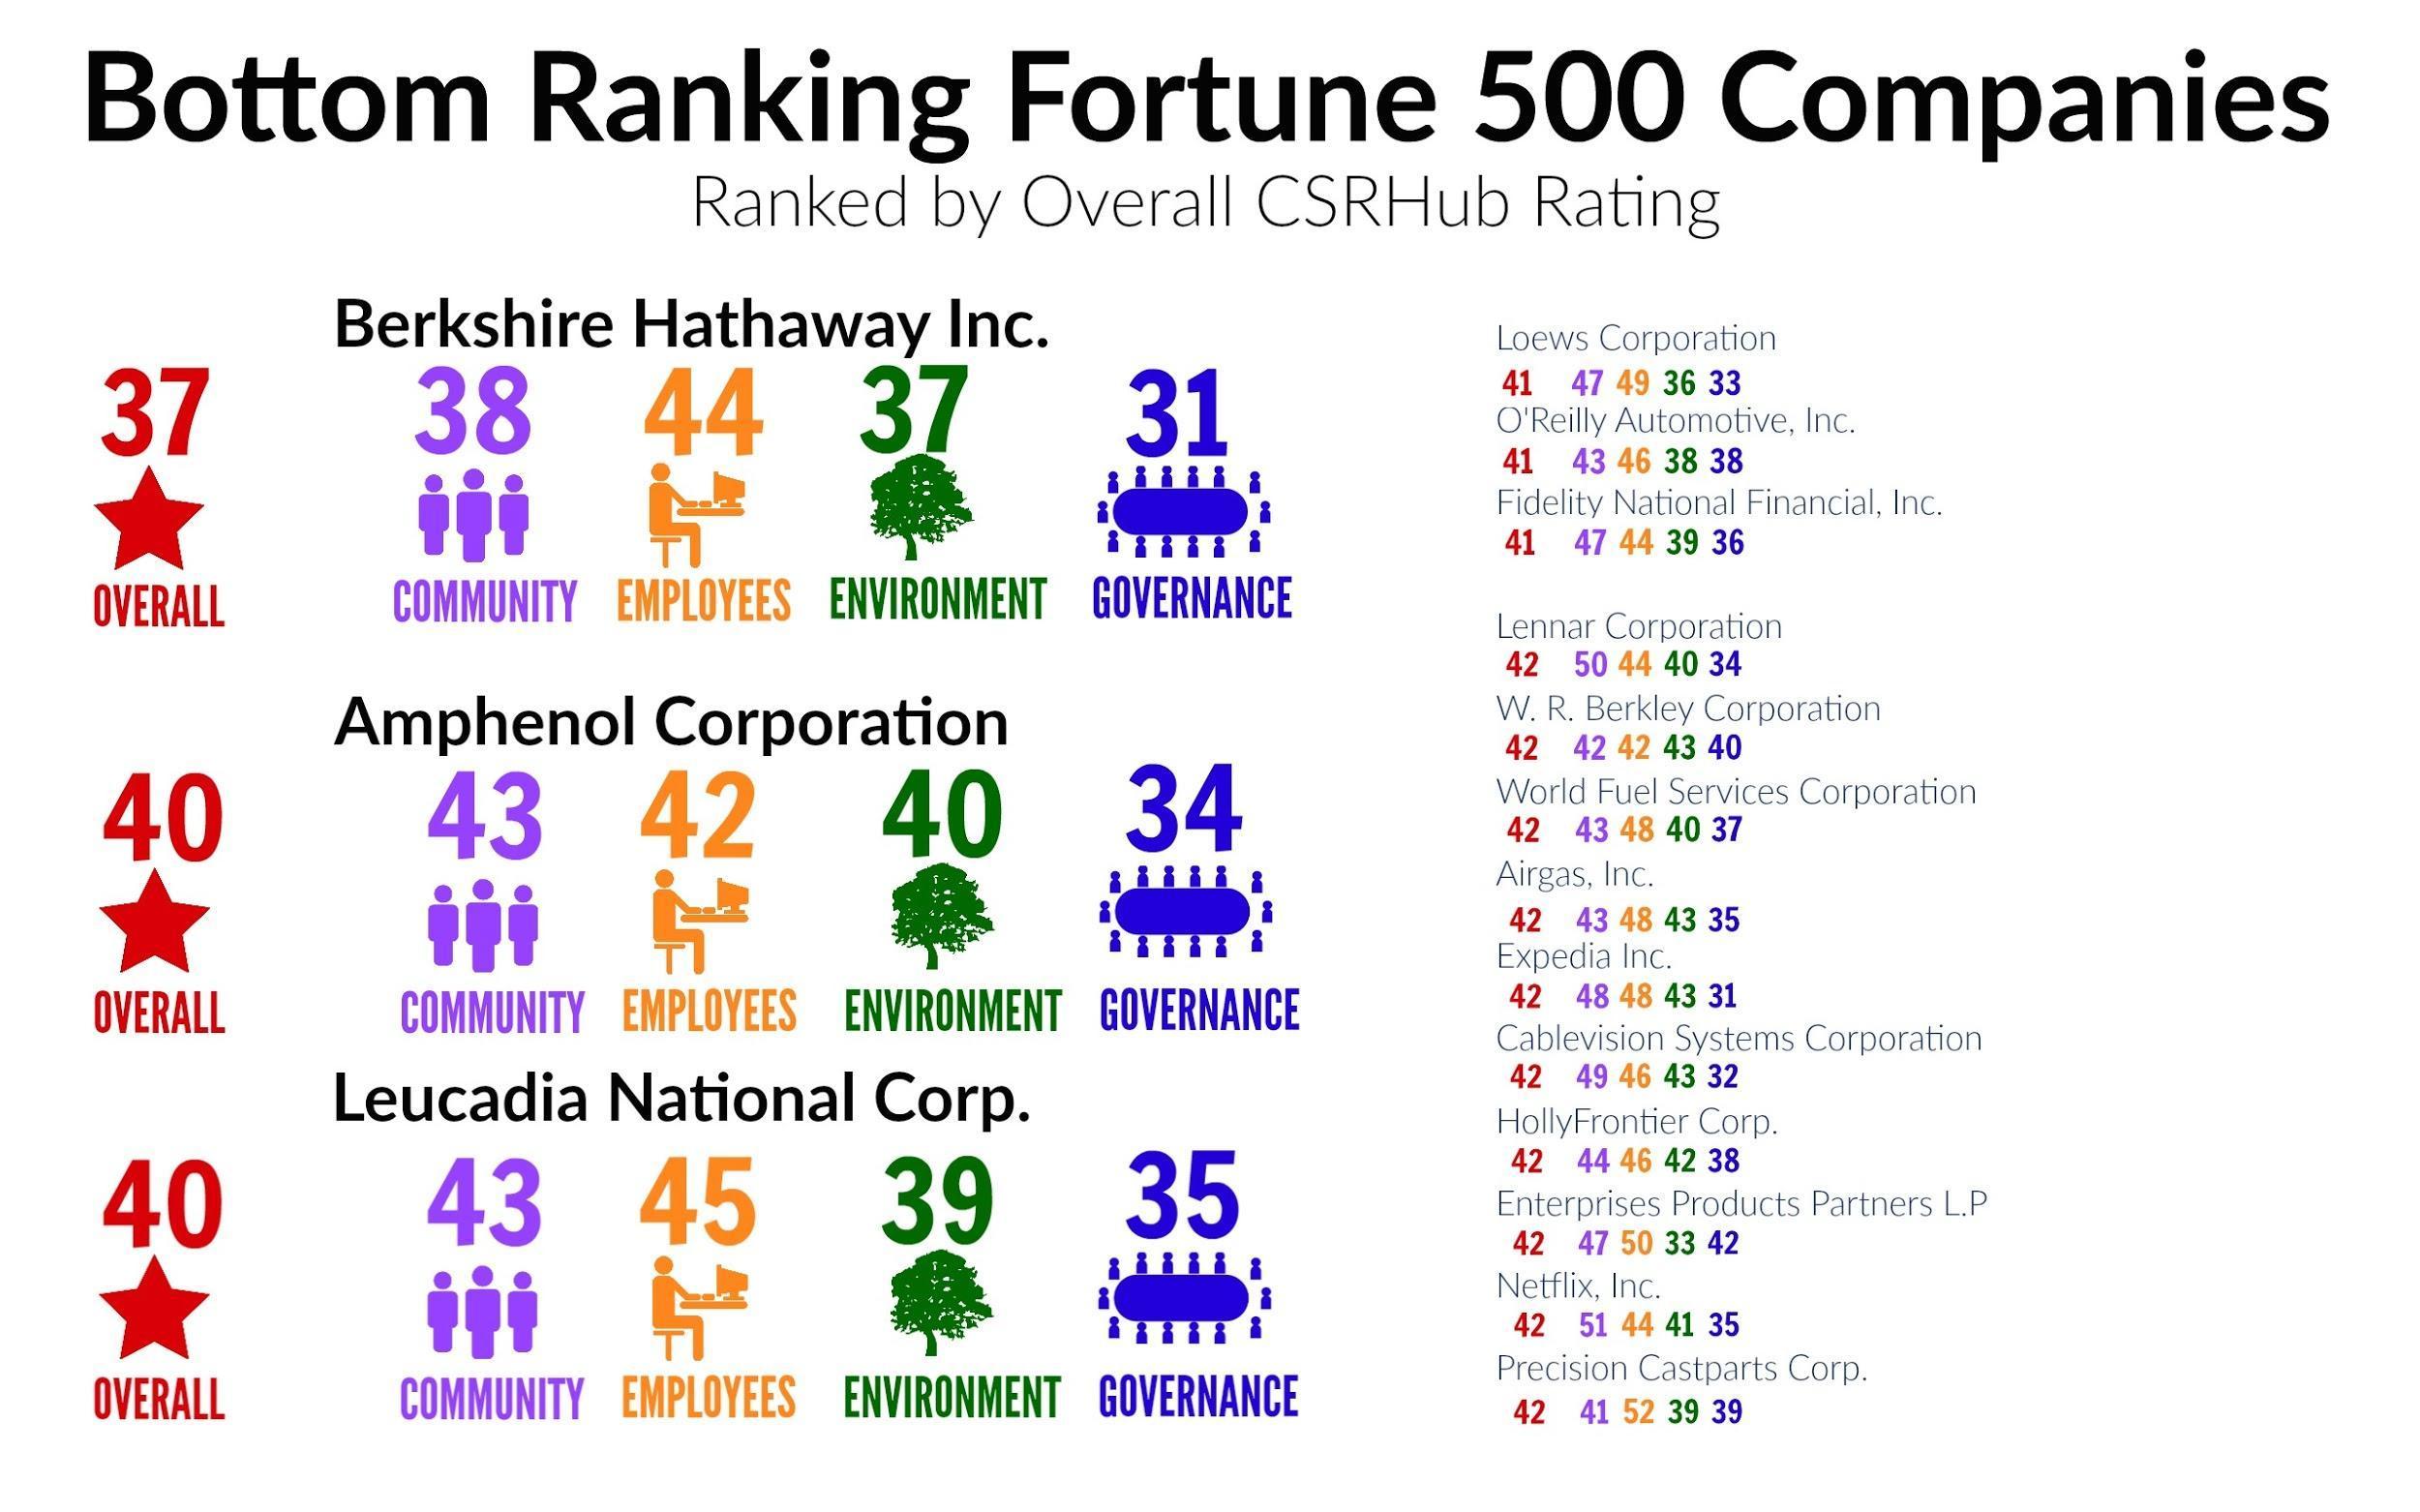 Bottom Ranking Fortune 500 Companies.jpg